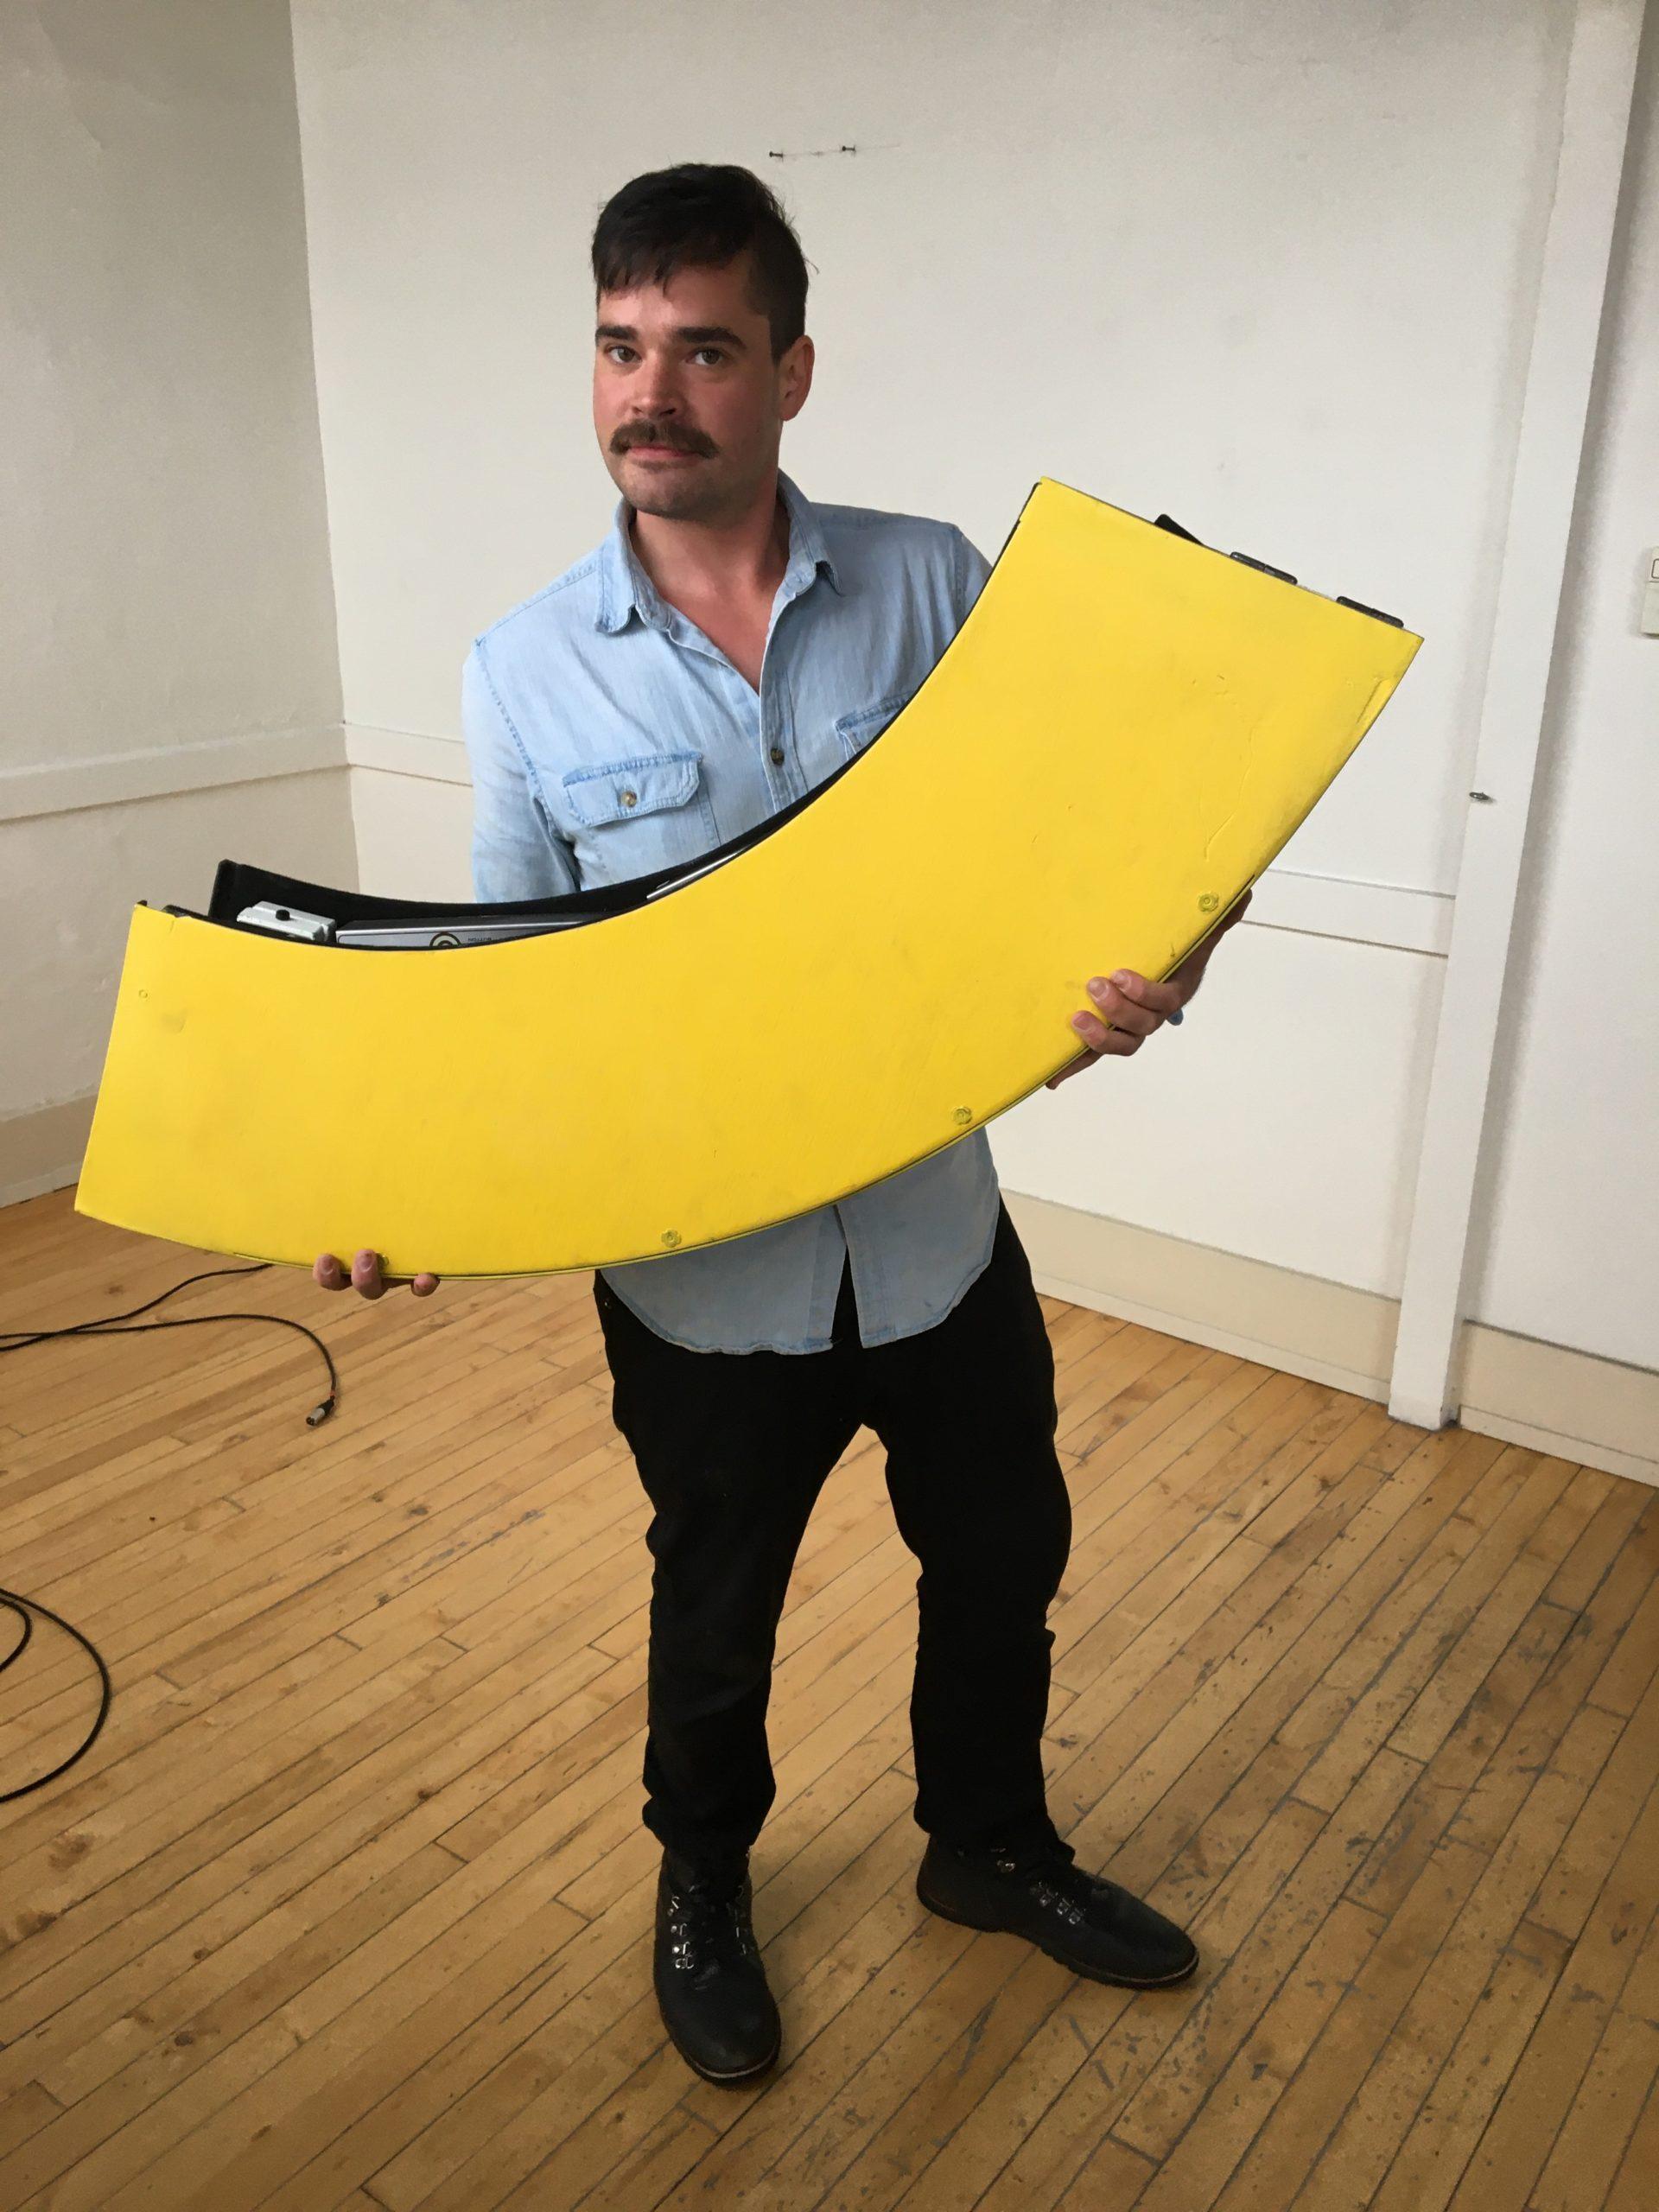 Holding Banana Board